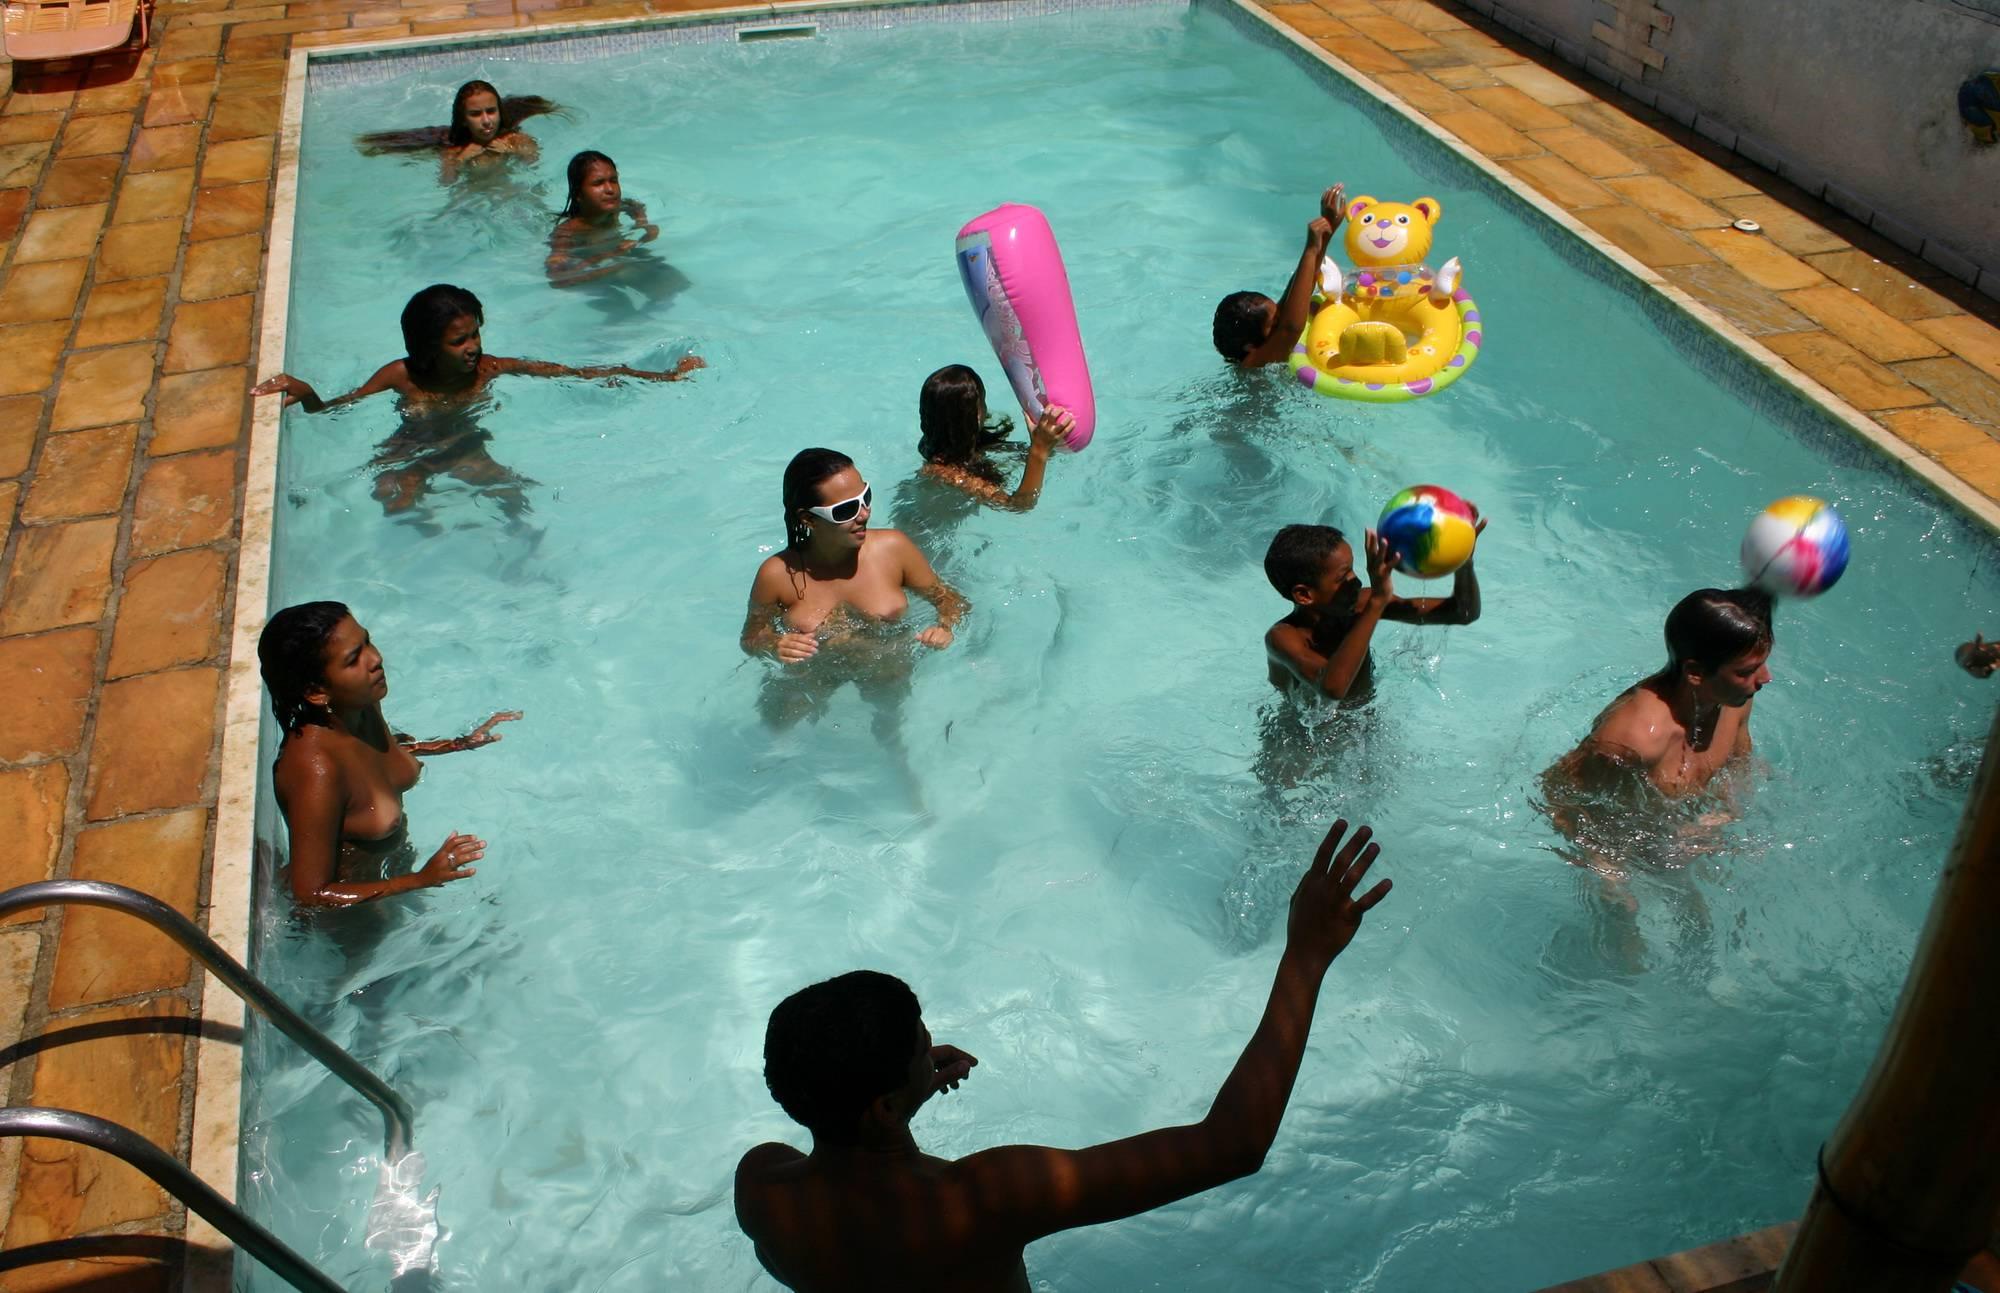 Pure Nudism Images Brazilian Pool Group Shots - 1